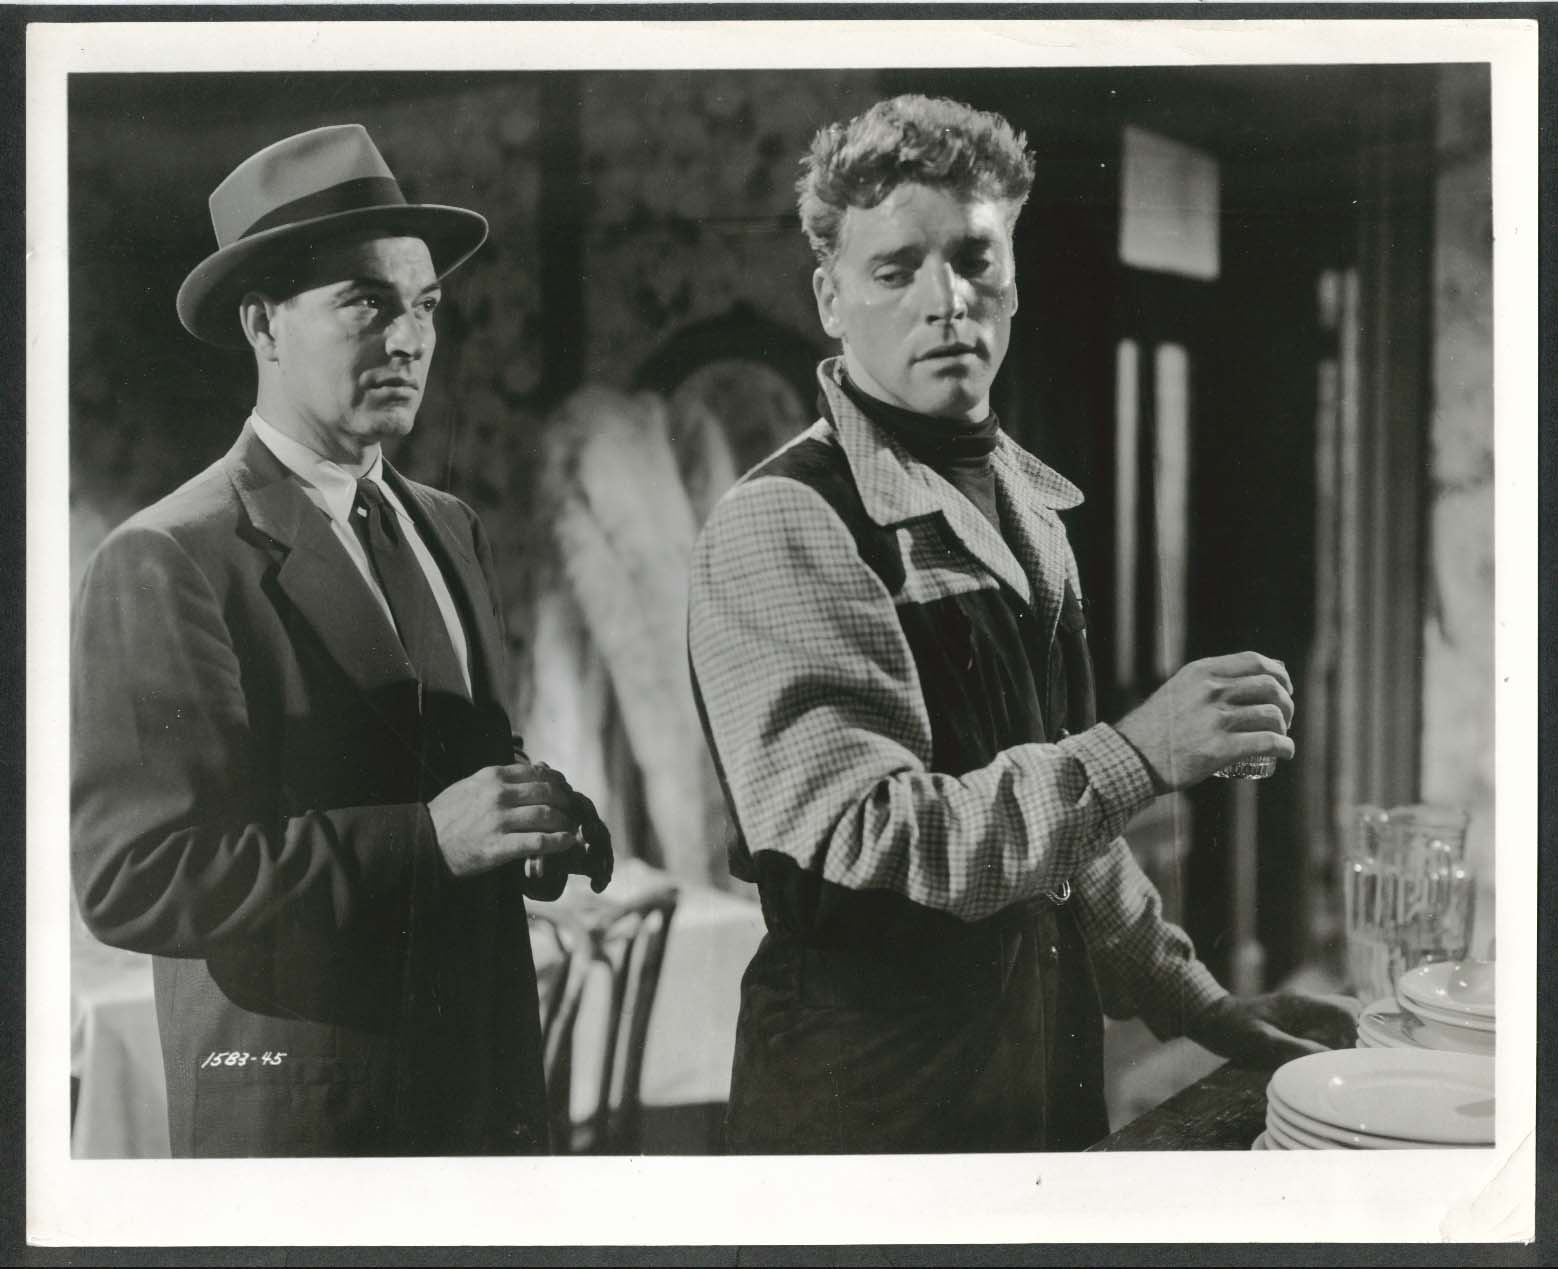 Image for Burt Lancaster 8x10 photograph 1940s